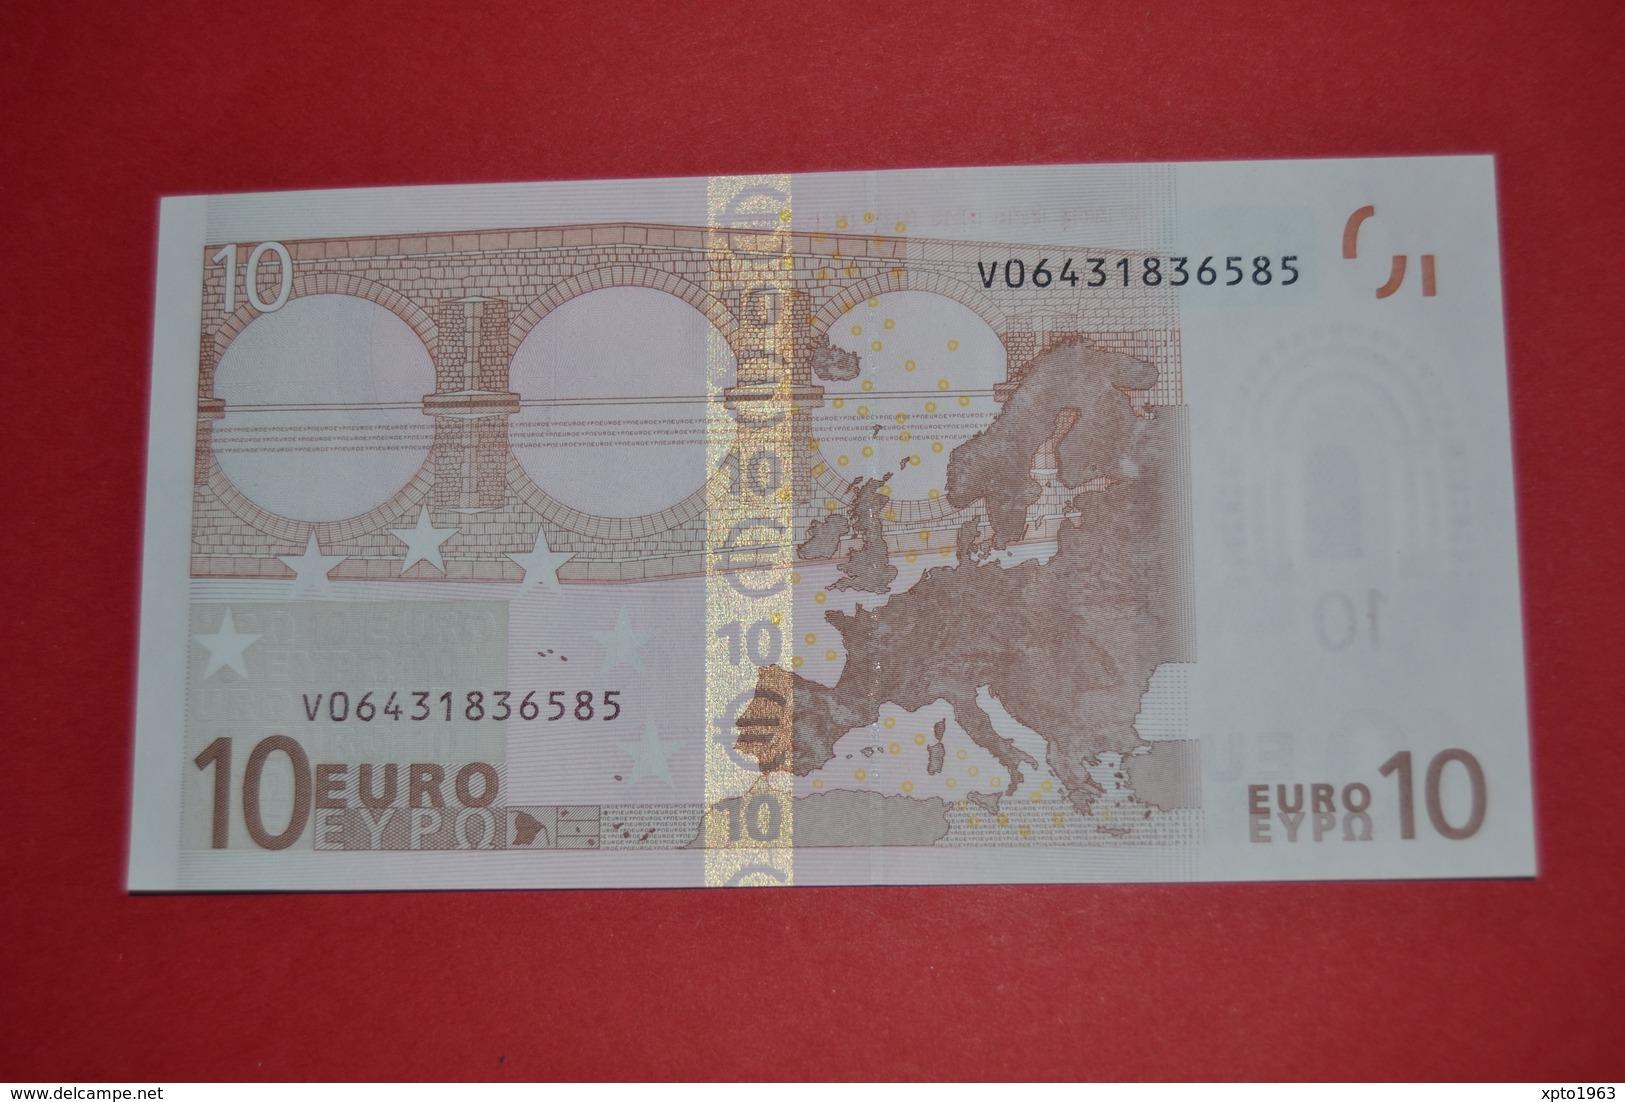 SPAIN 10 EURO M003 A1 - M003A1 DUISENBERG - V06431836585 UNC FDS NEUF - EURO